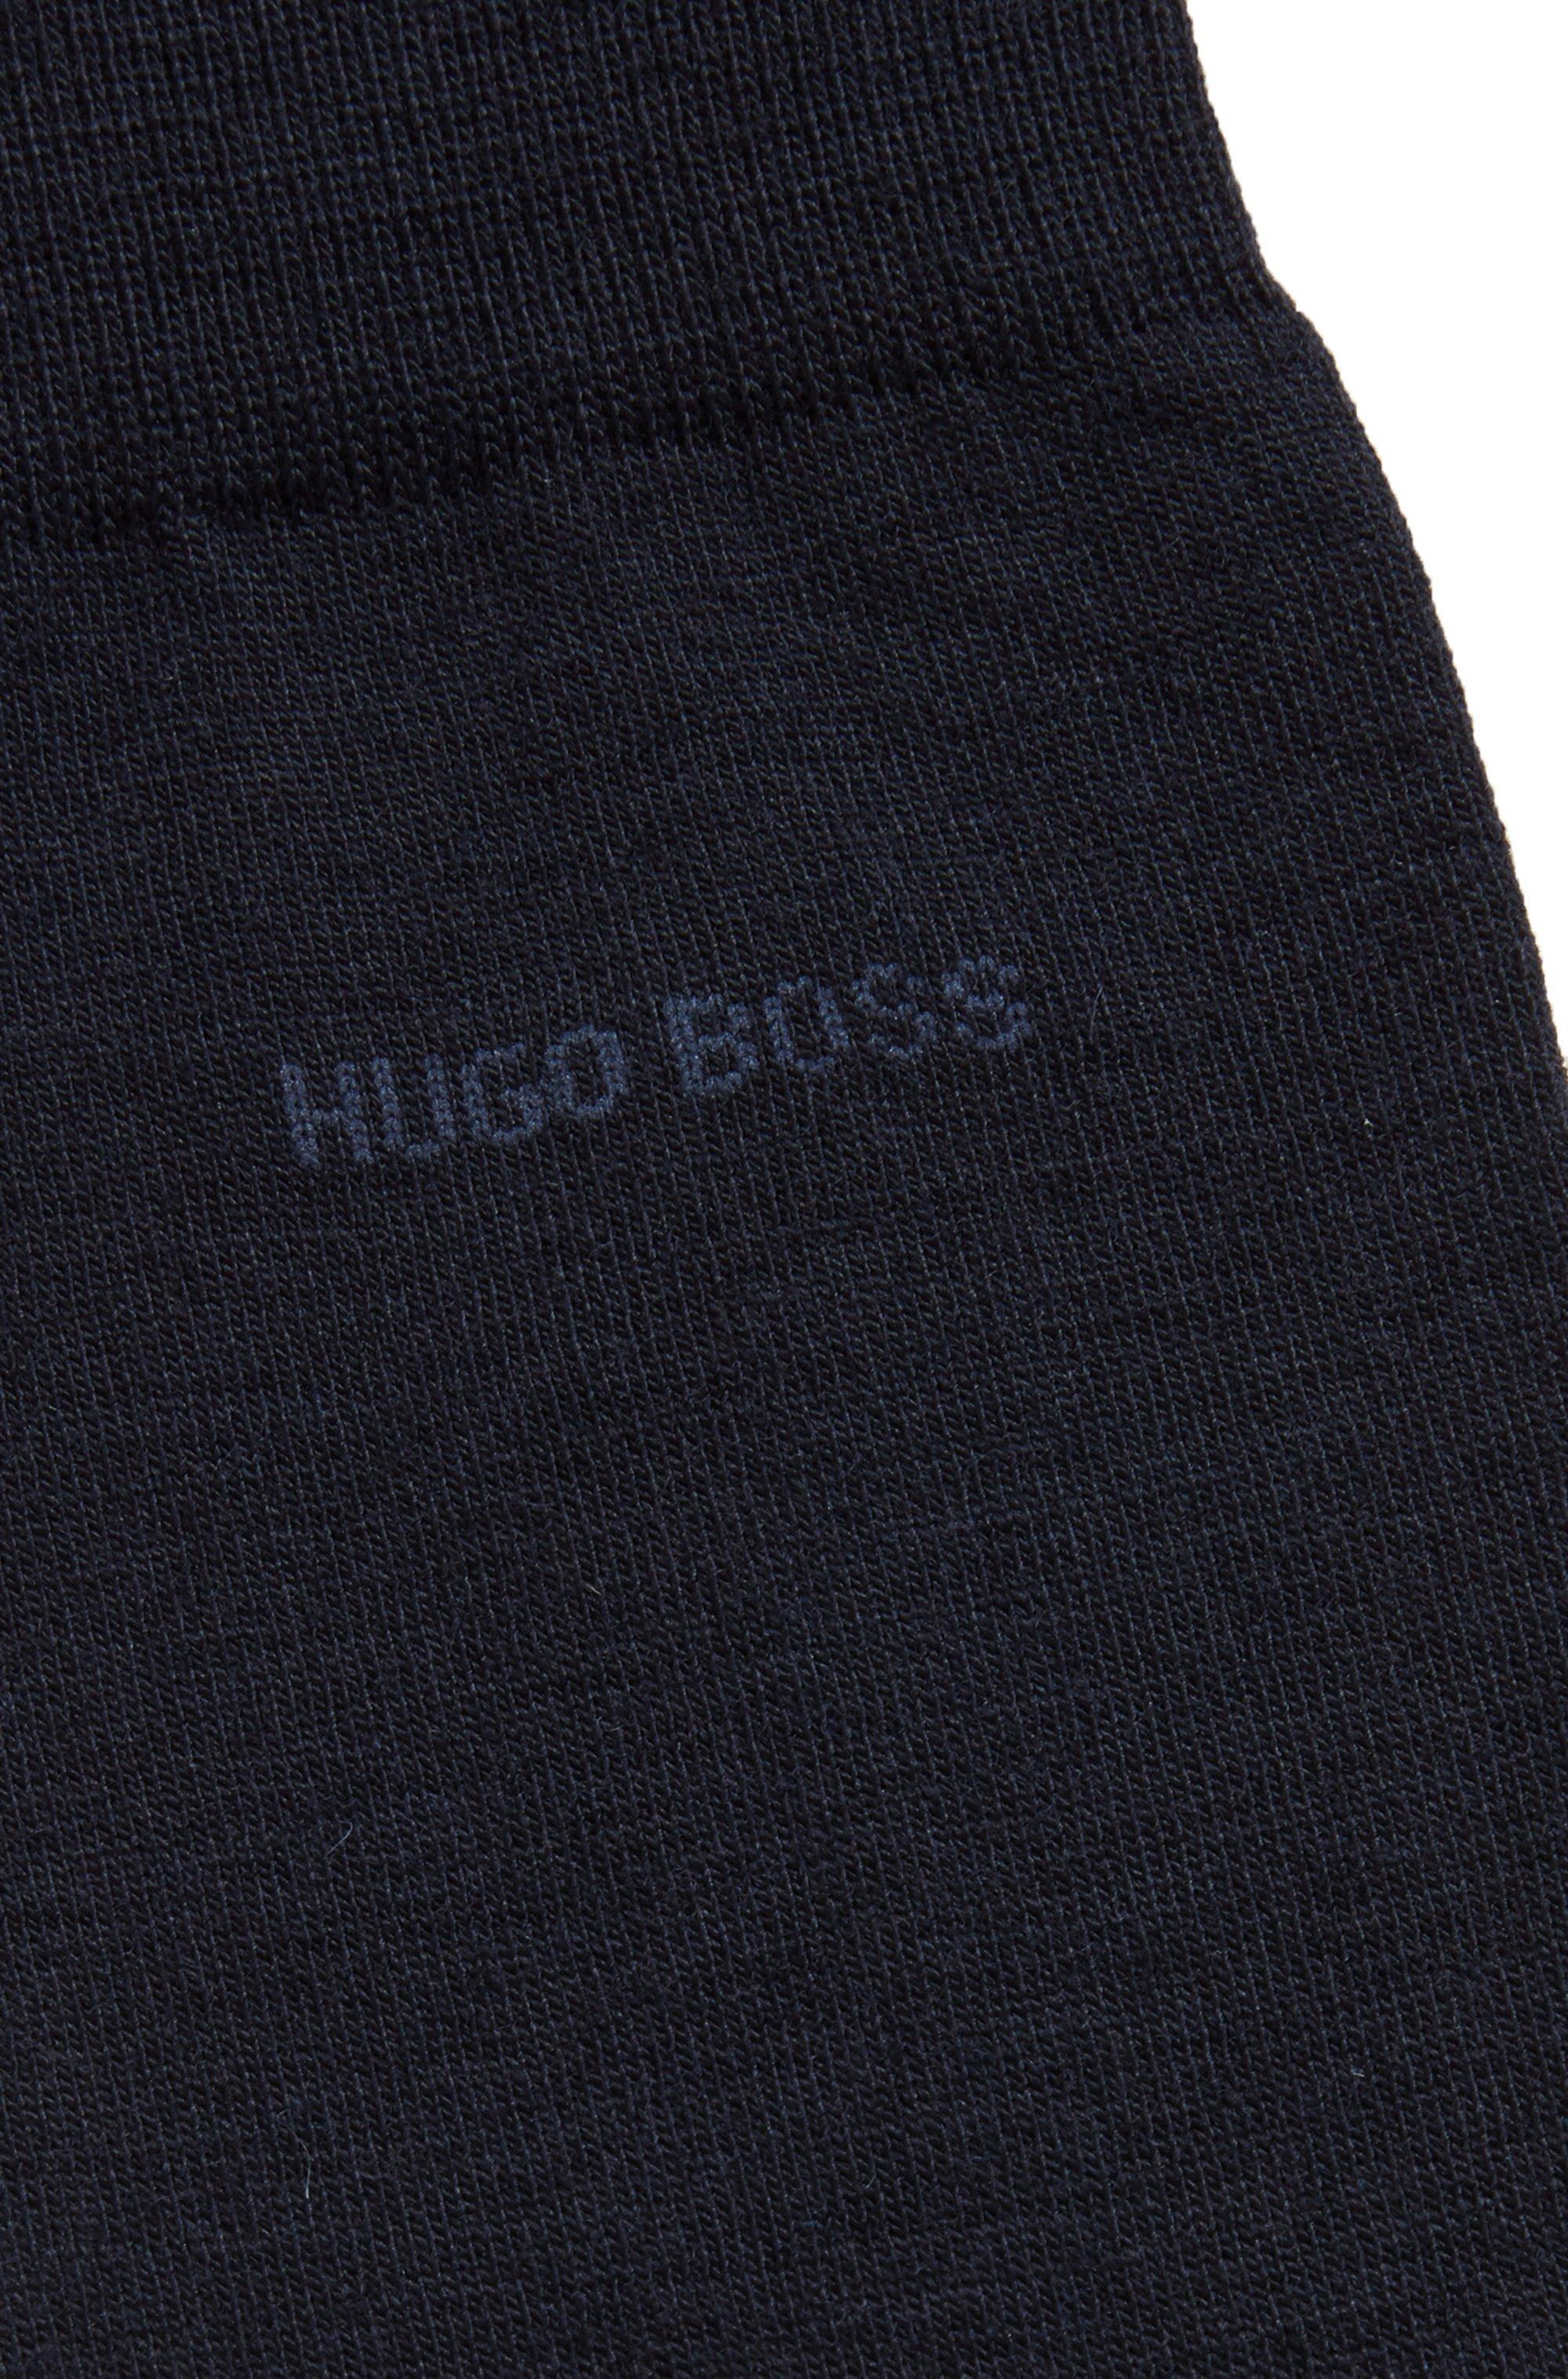 Wool-blend socks with Naturetexx® finishing